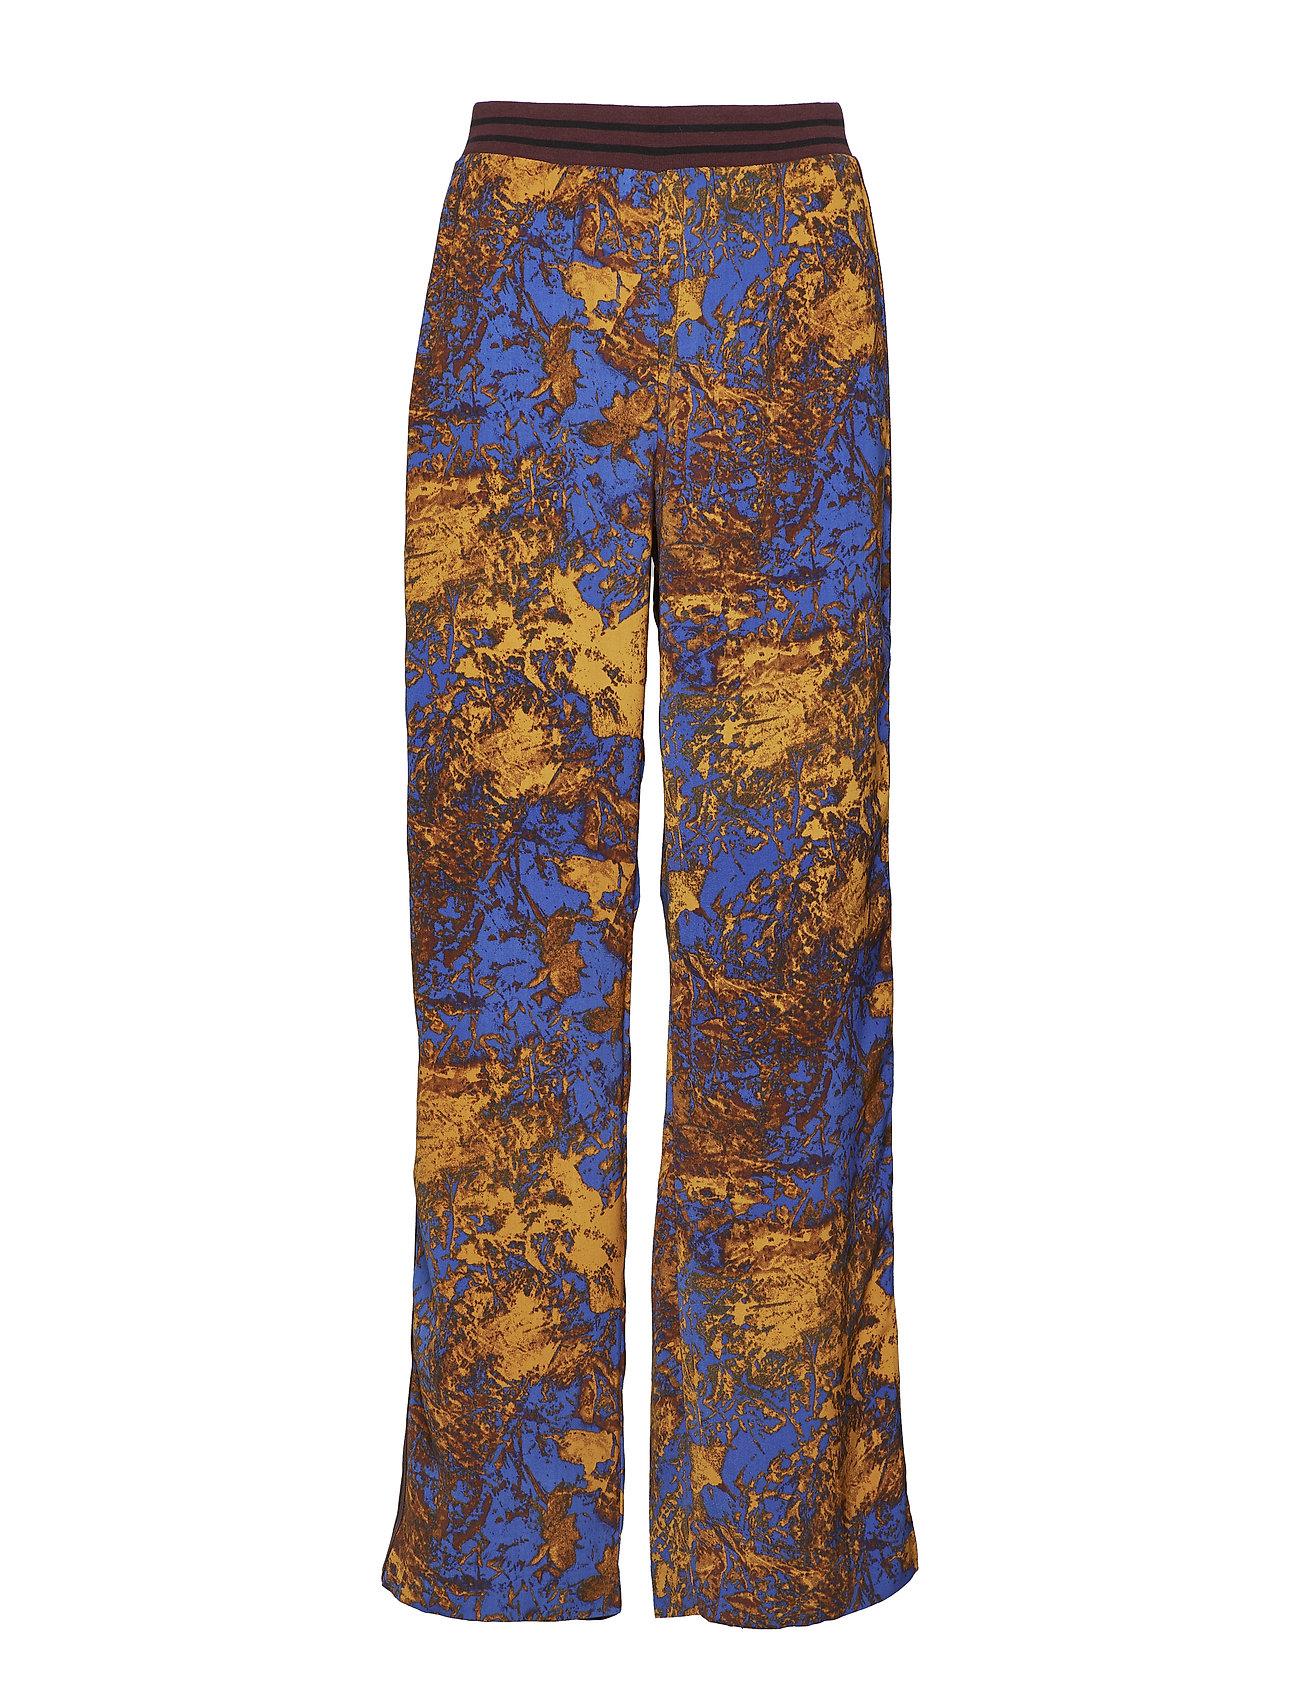 Jeans Sweden Sweden DaisypatternTiger Of Jeans Of DaisypatternTiger J1KlFc3T